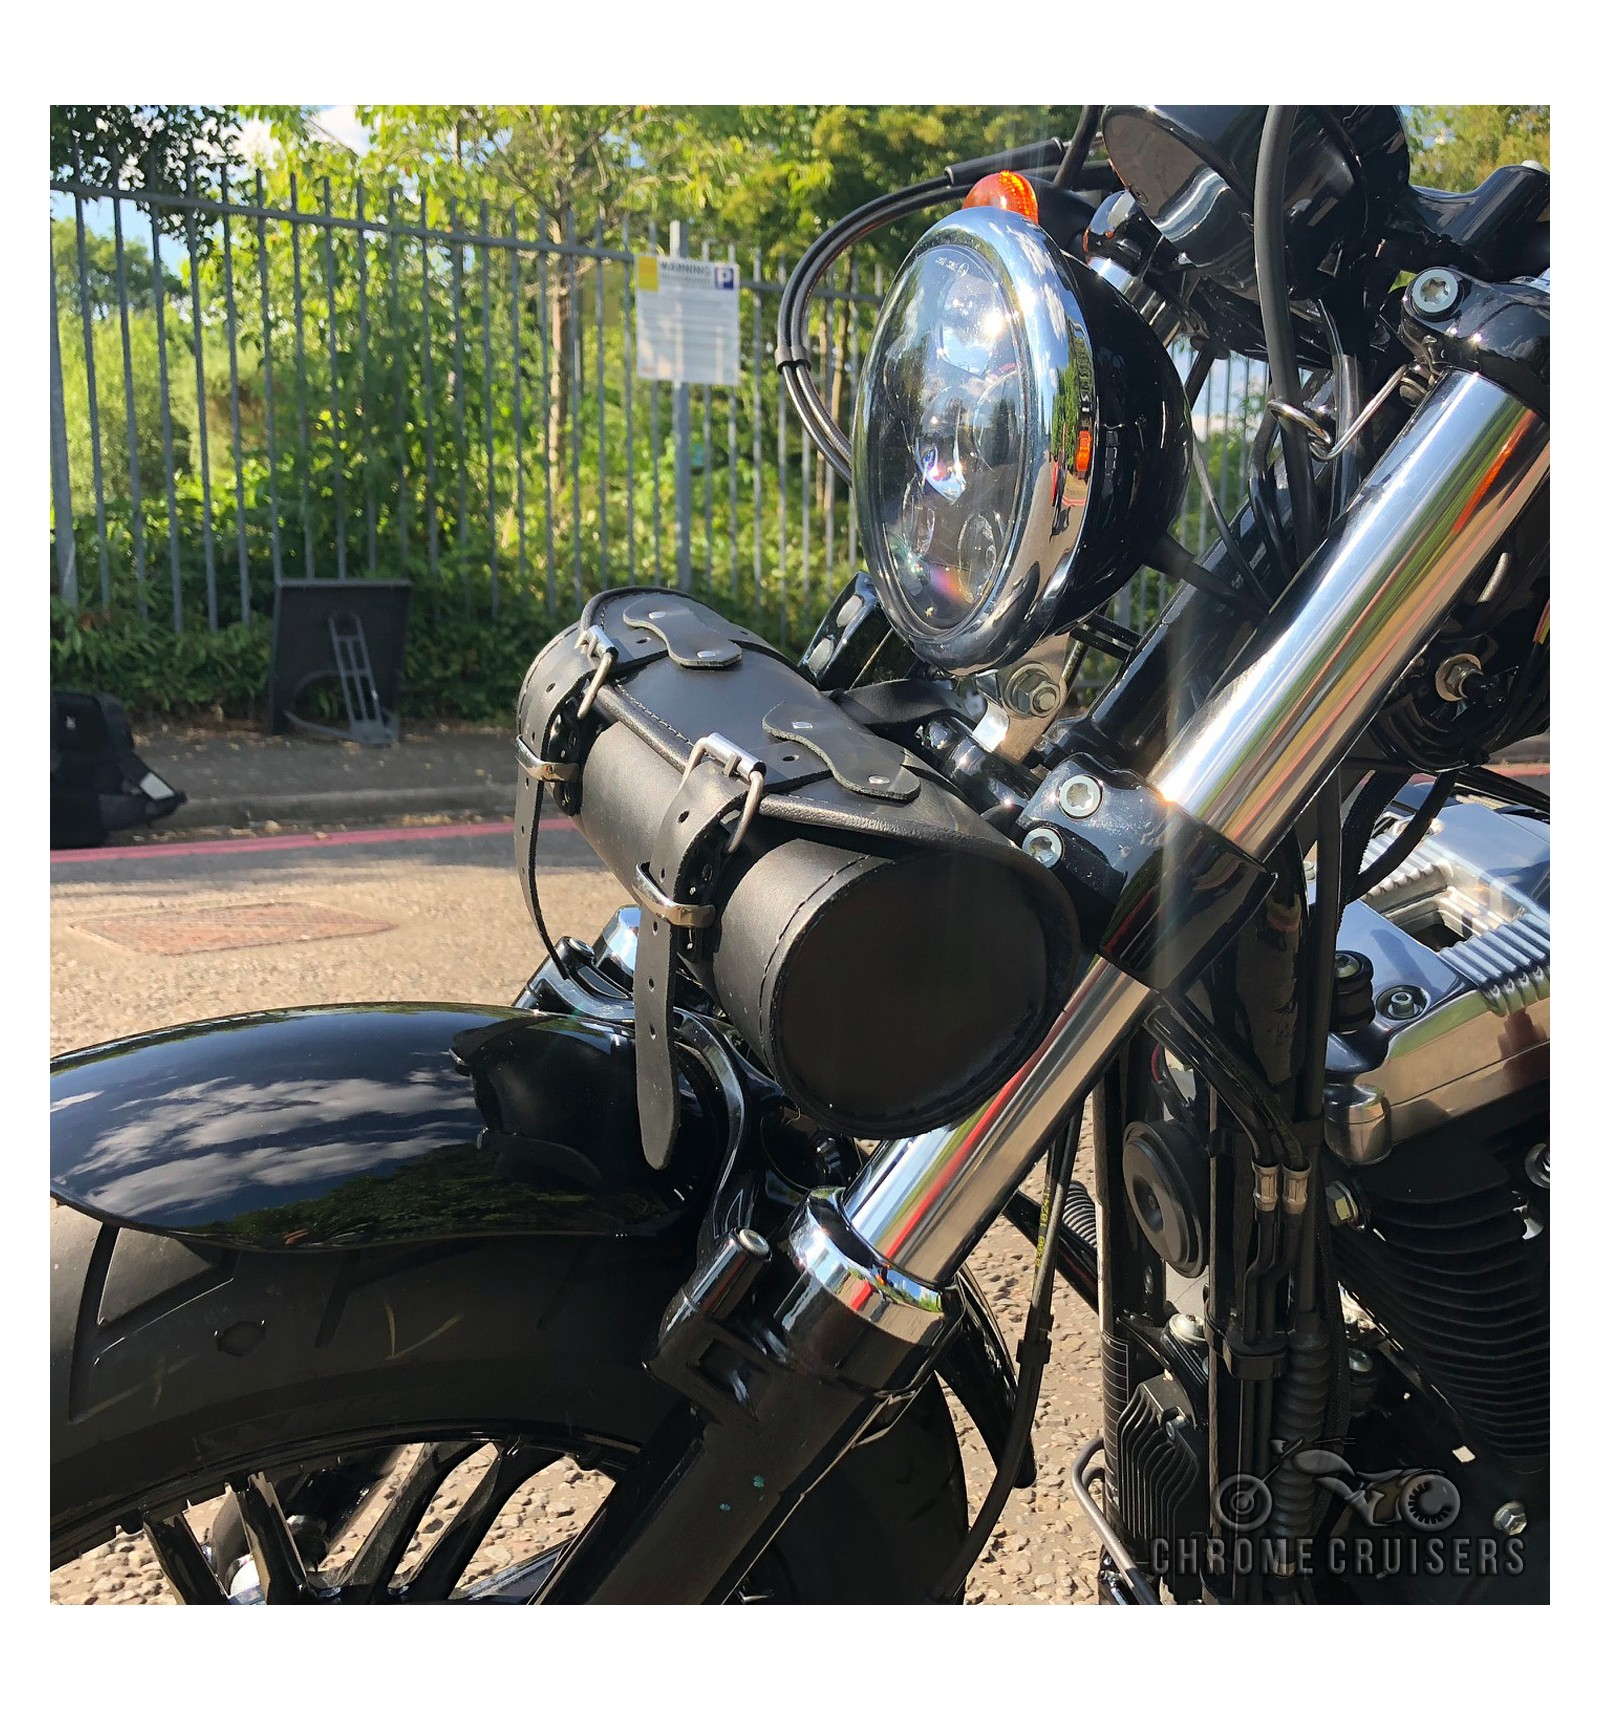 MOTORCYCLE LEATHER TOOL ROLL SADDLE BAG HONDA VTX 1300 VTX 1800 VT600 C2 SHADOW